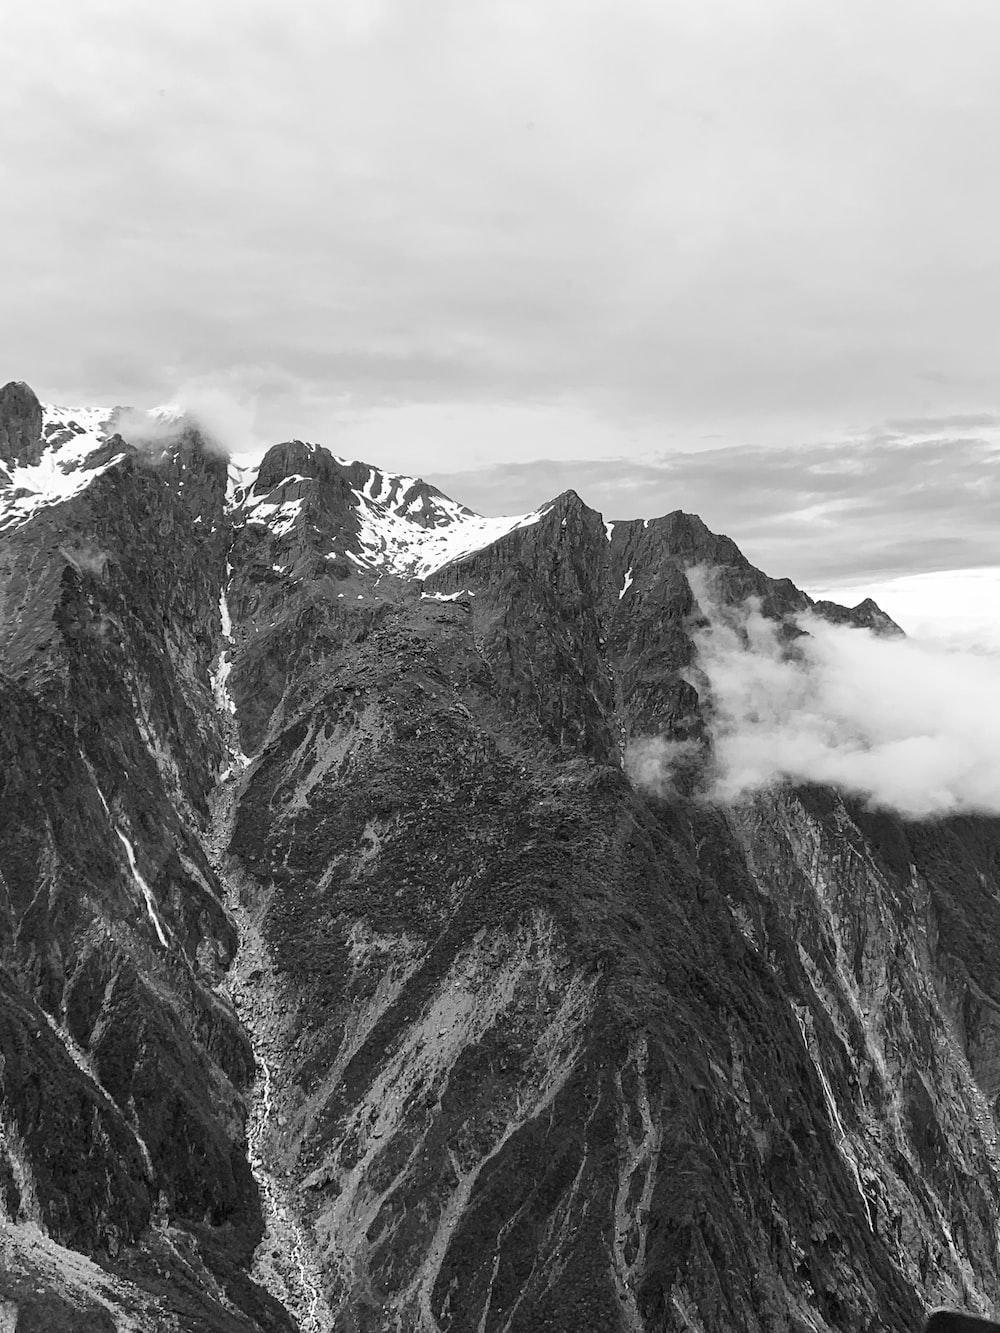 grayscale photo of mountain range